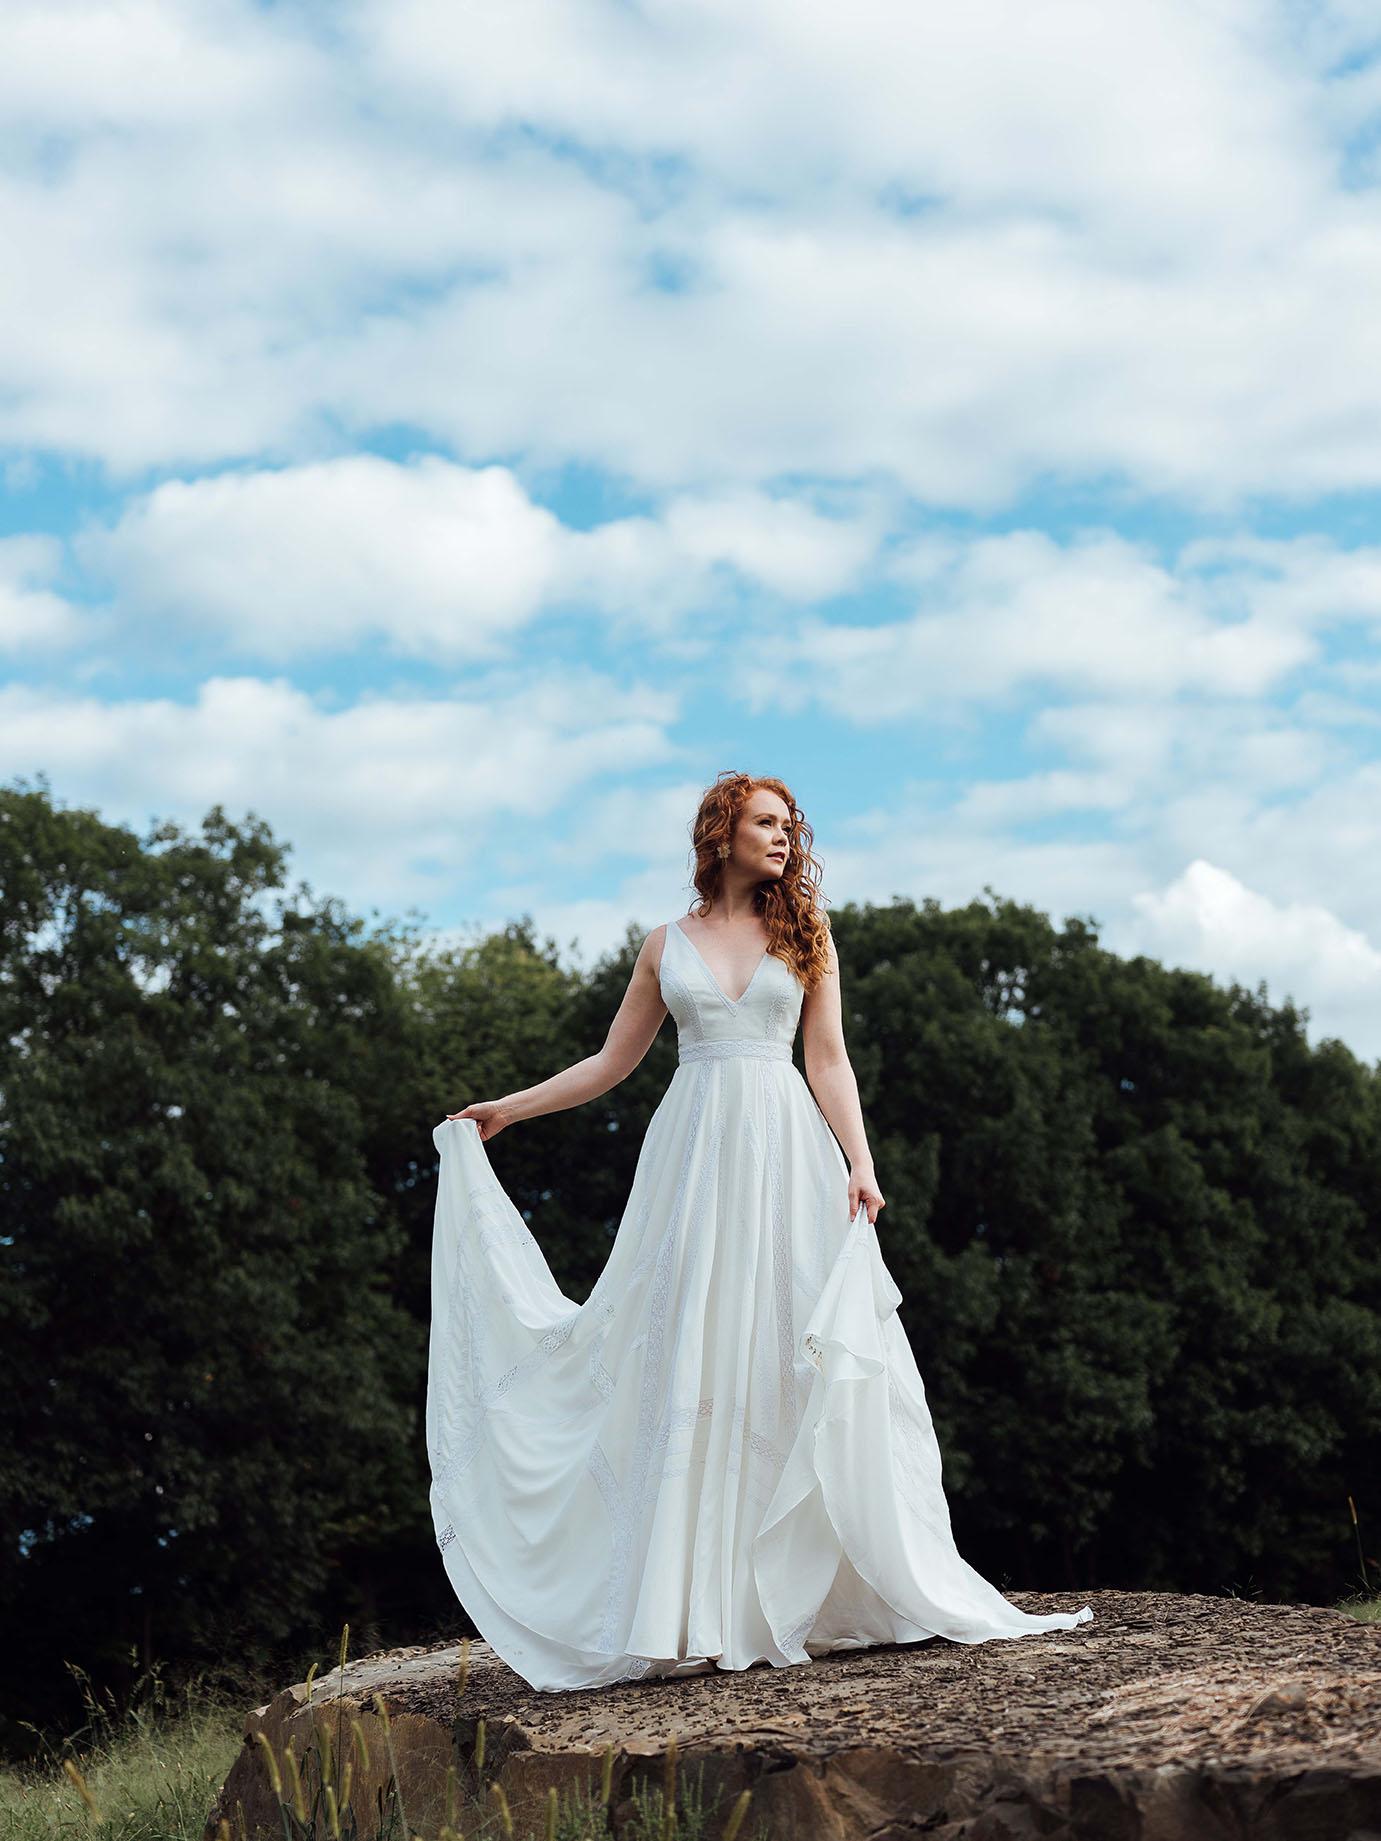 WSPCo-Gather-Greene-Rebecca-Schoneveld-Bridal-197_Theo_boho_bridal_style_flowy_wedding_gown.jpg